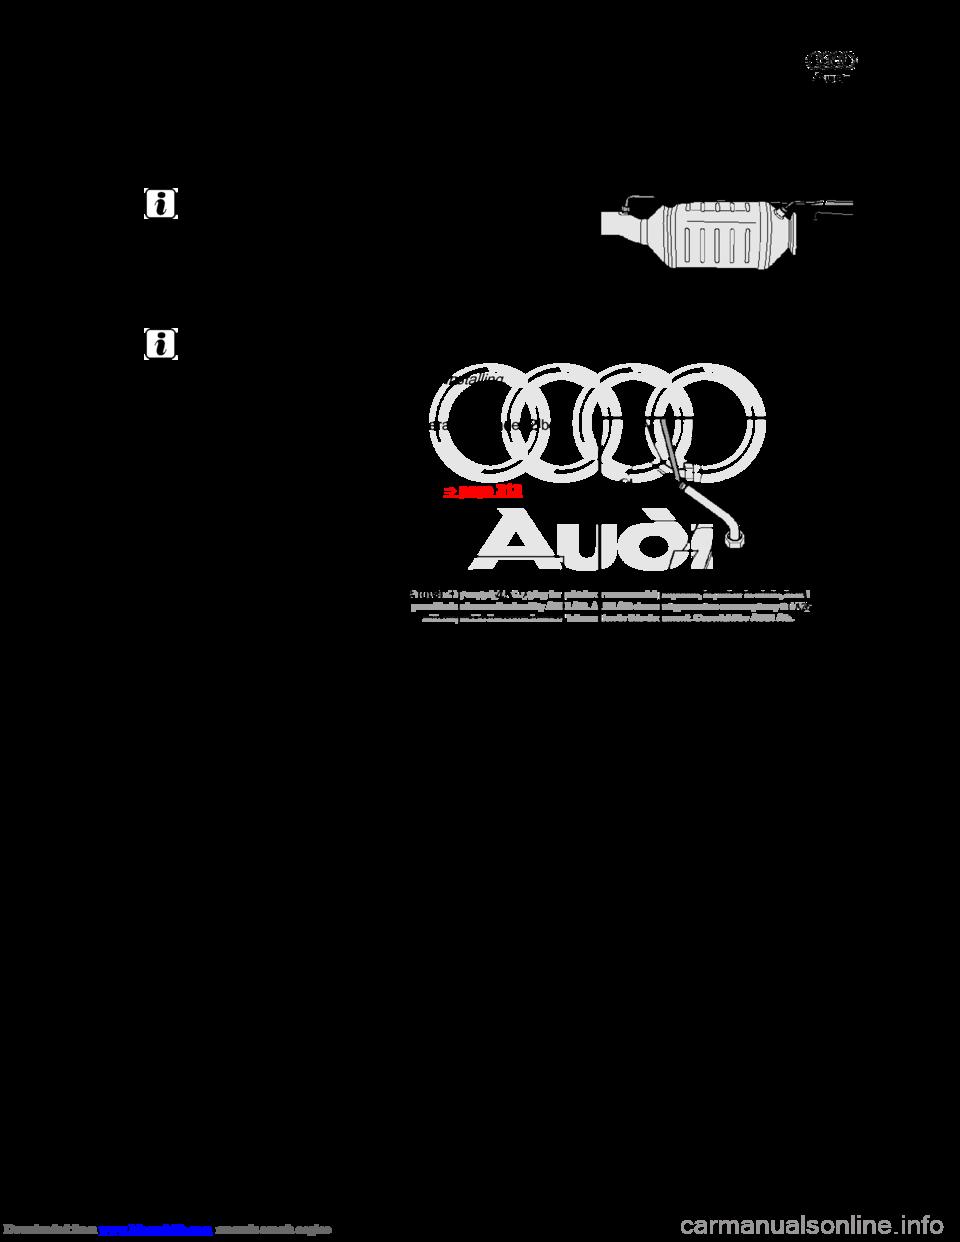 Audi A8 2003 D3 2g Bvn Bmc Engines Workshop Manual 1 8 Engine Diagram